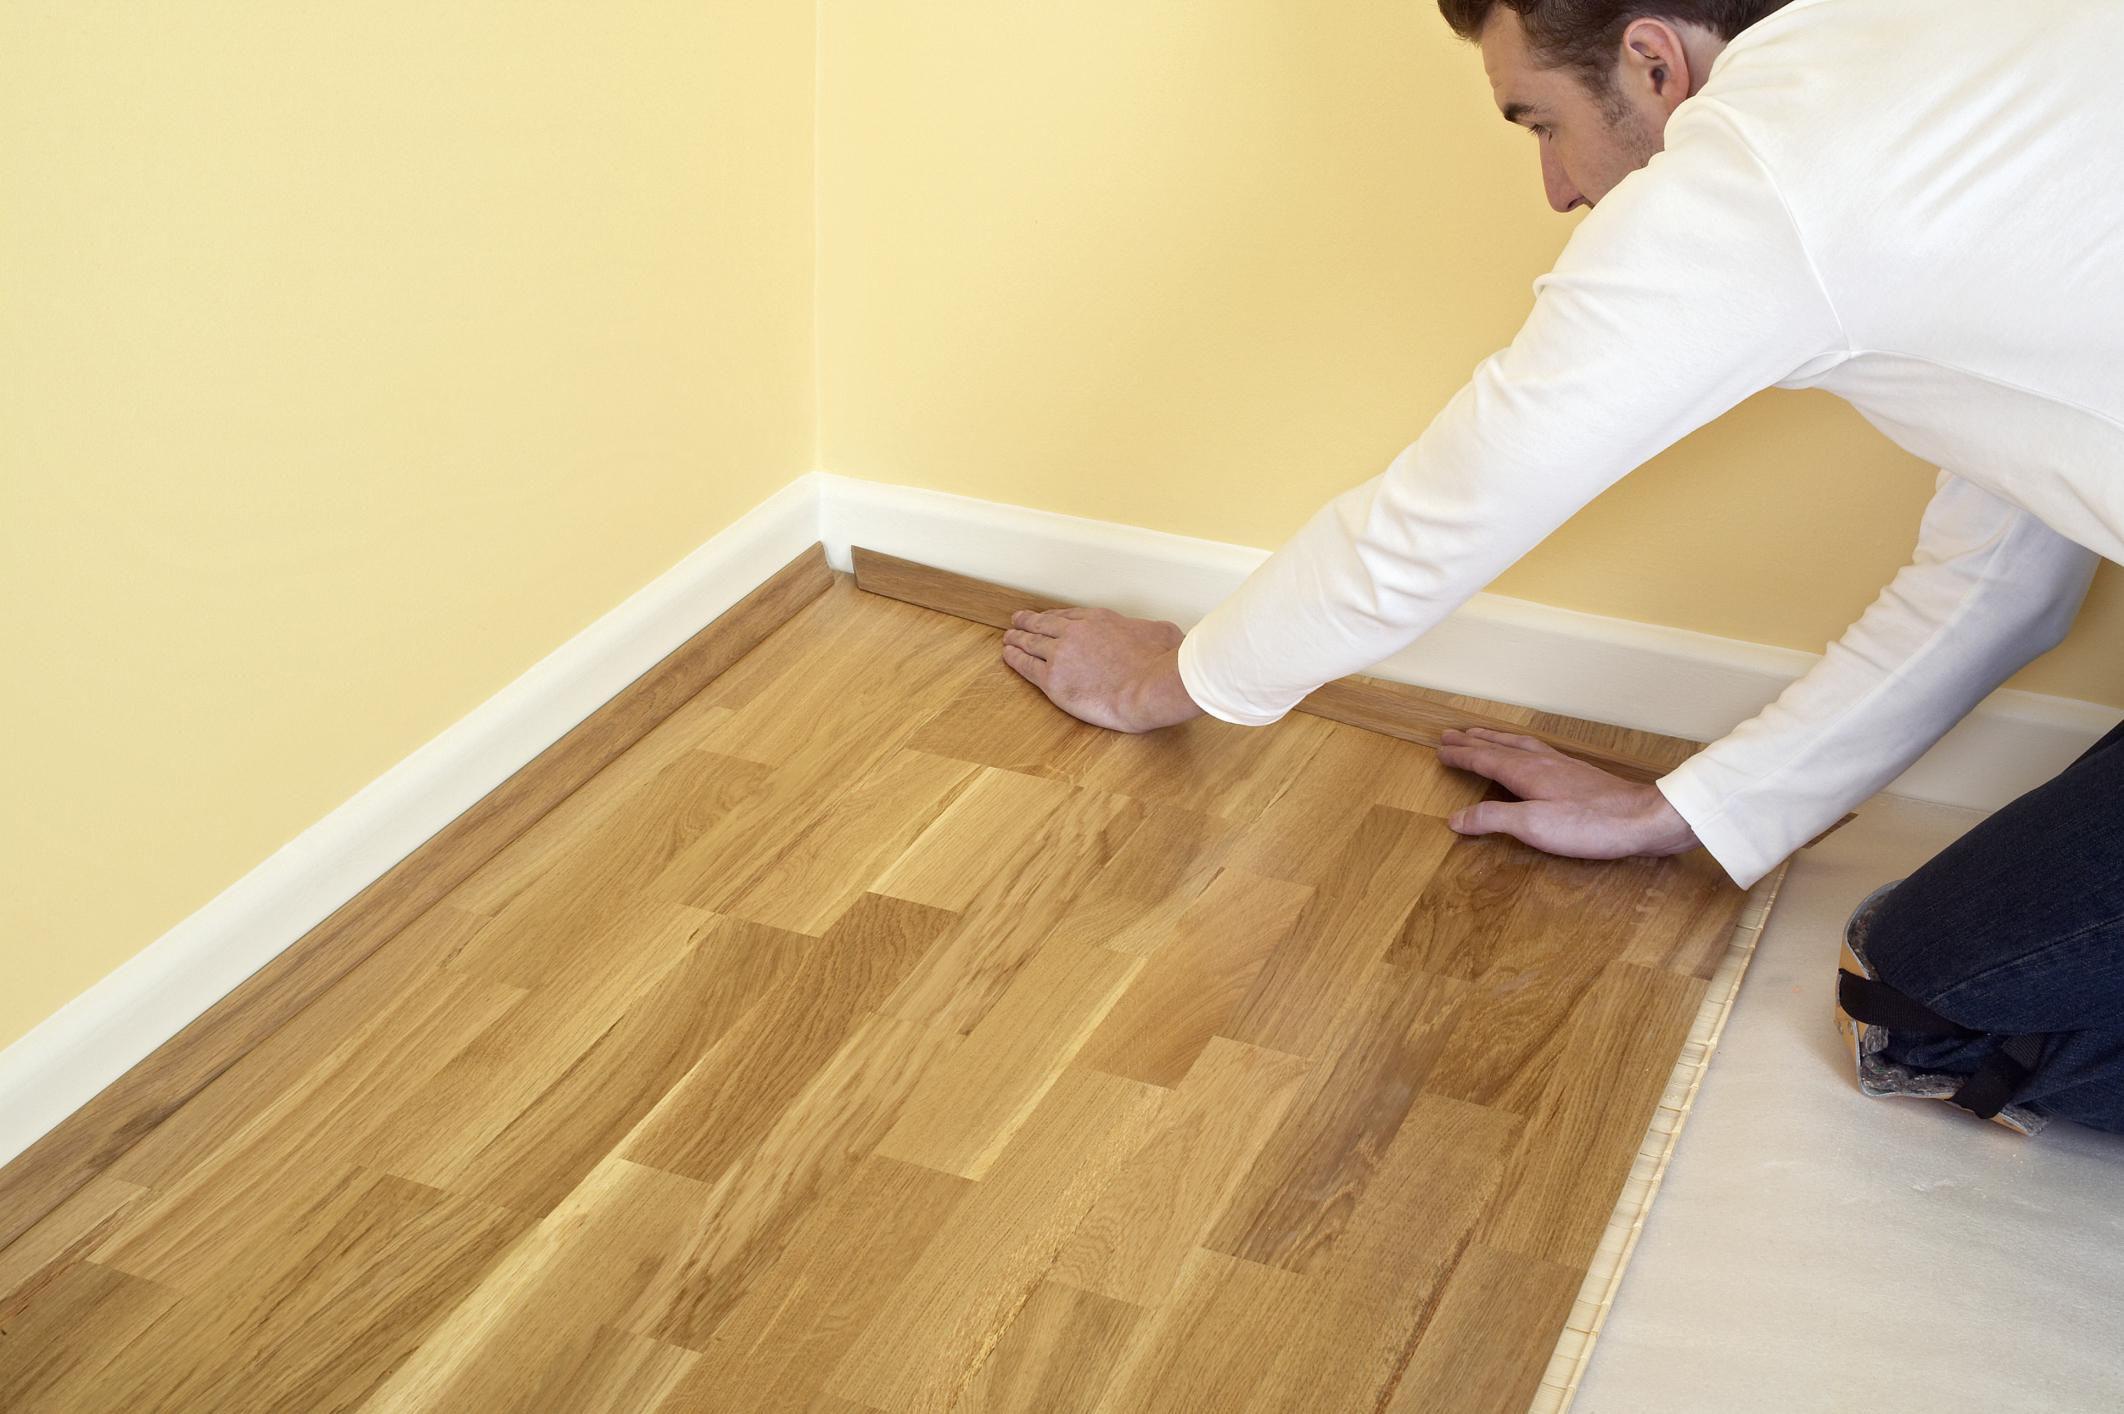 hardwood floor to tile reducer of basics of 12 mm laminate flooring regarding 80033008 56a49f155f9b58b7d0d7e0be